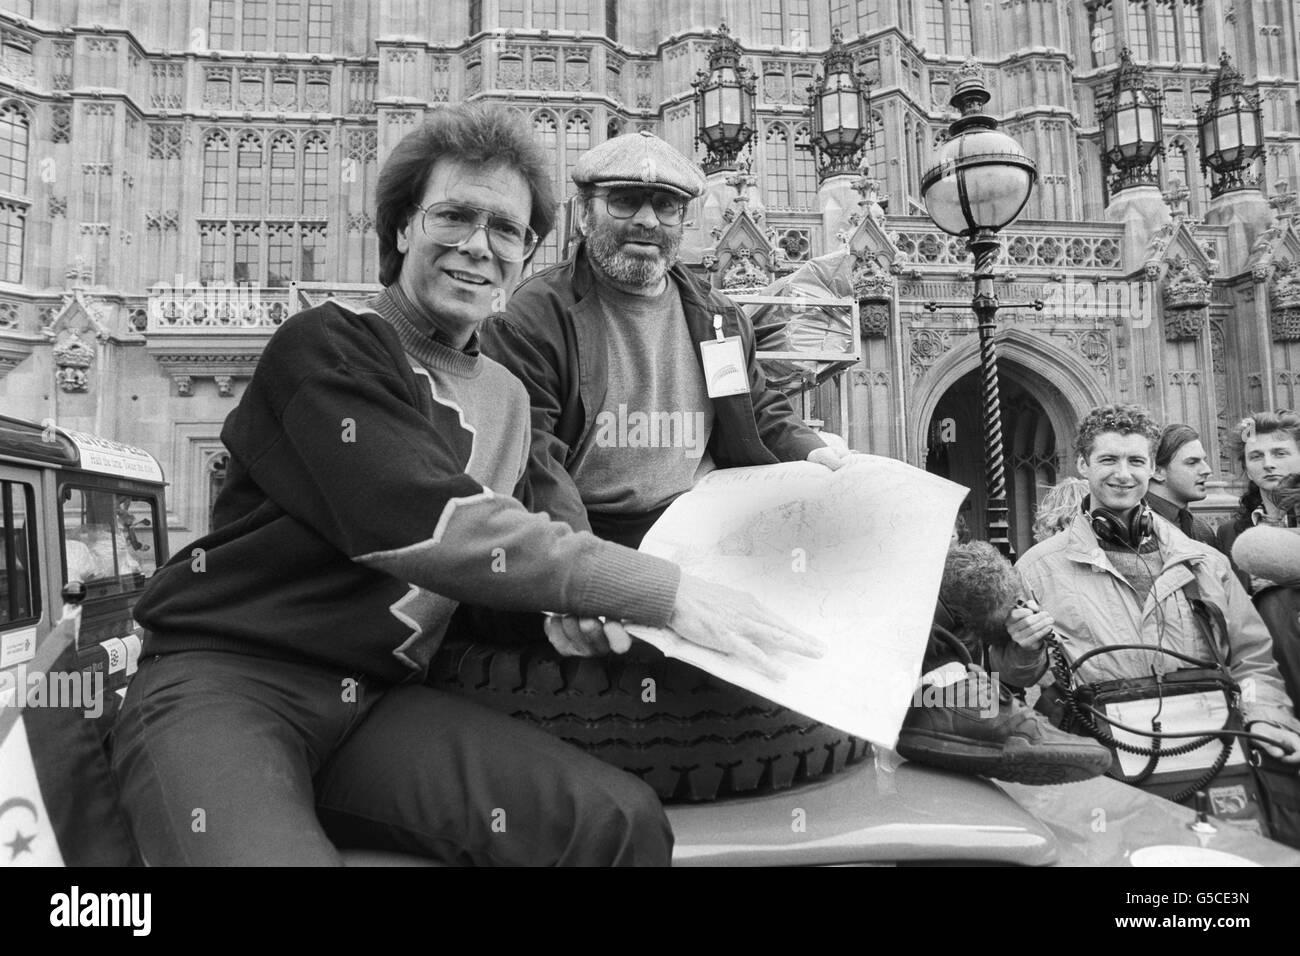 Charity - Sahara Drive - Bob Hoskins - London - Stock Image